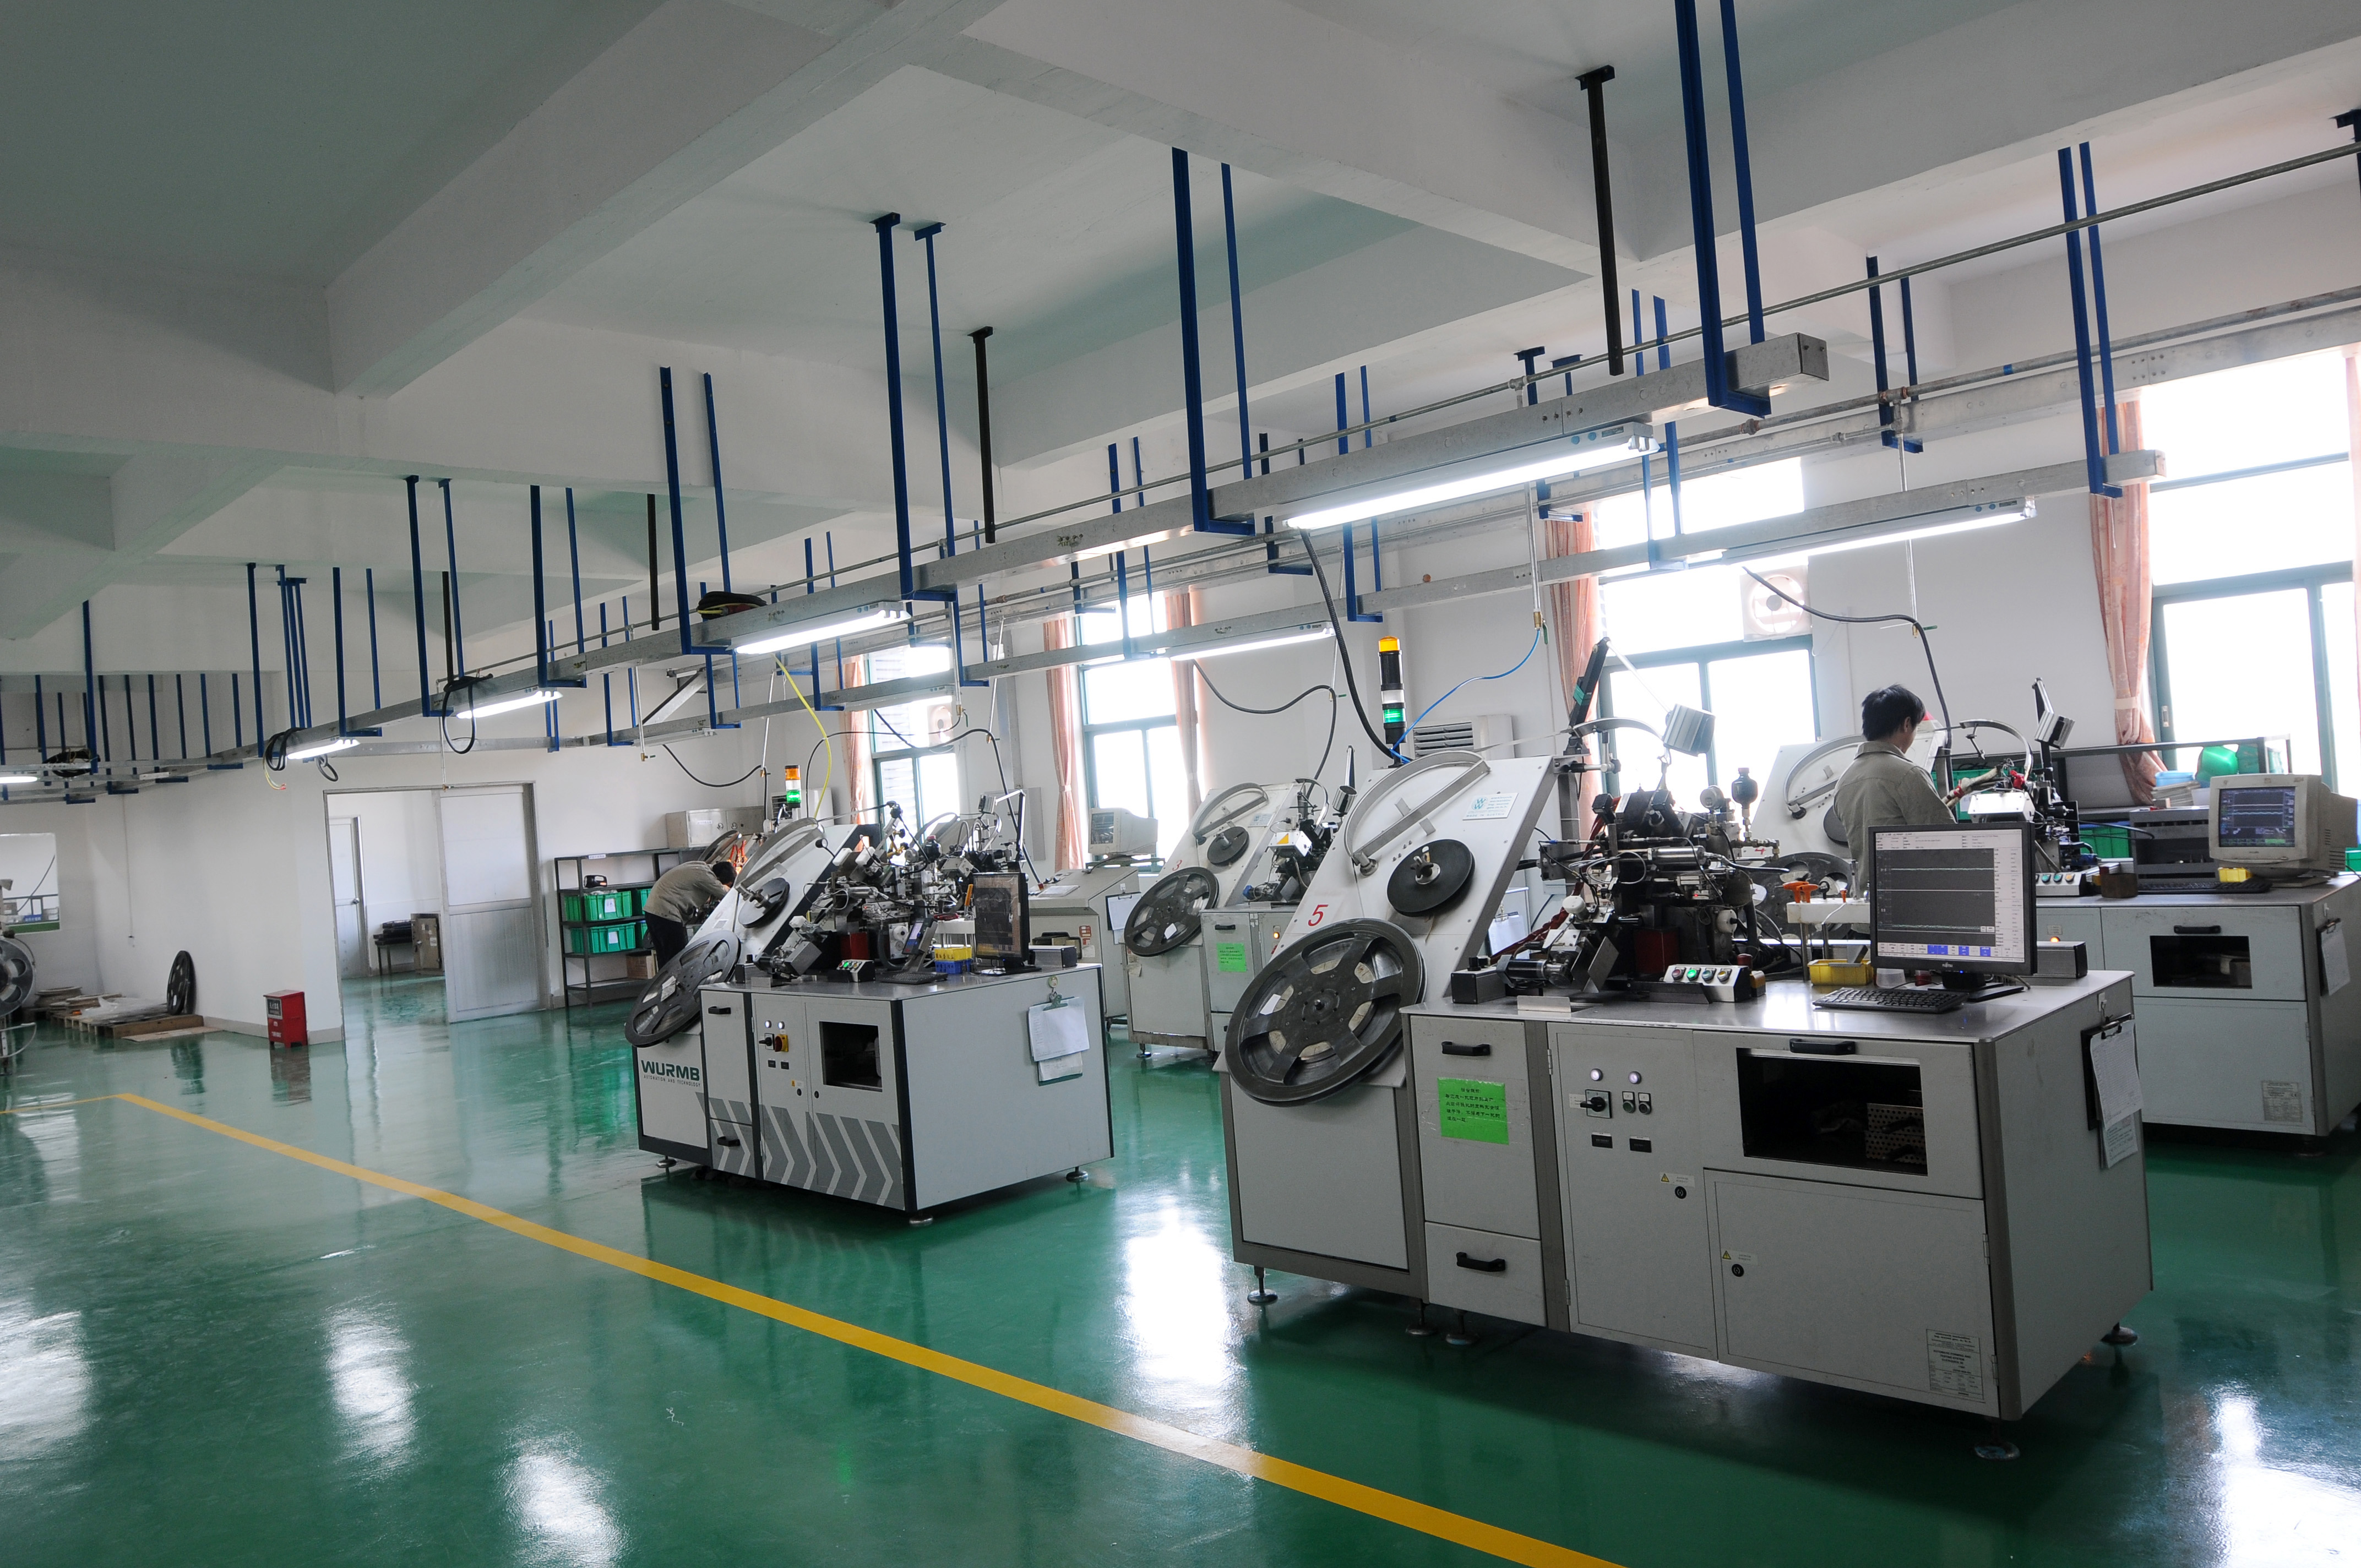 Semi-automatic riveting machine